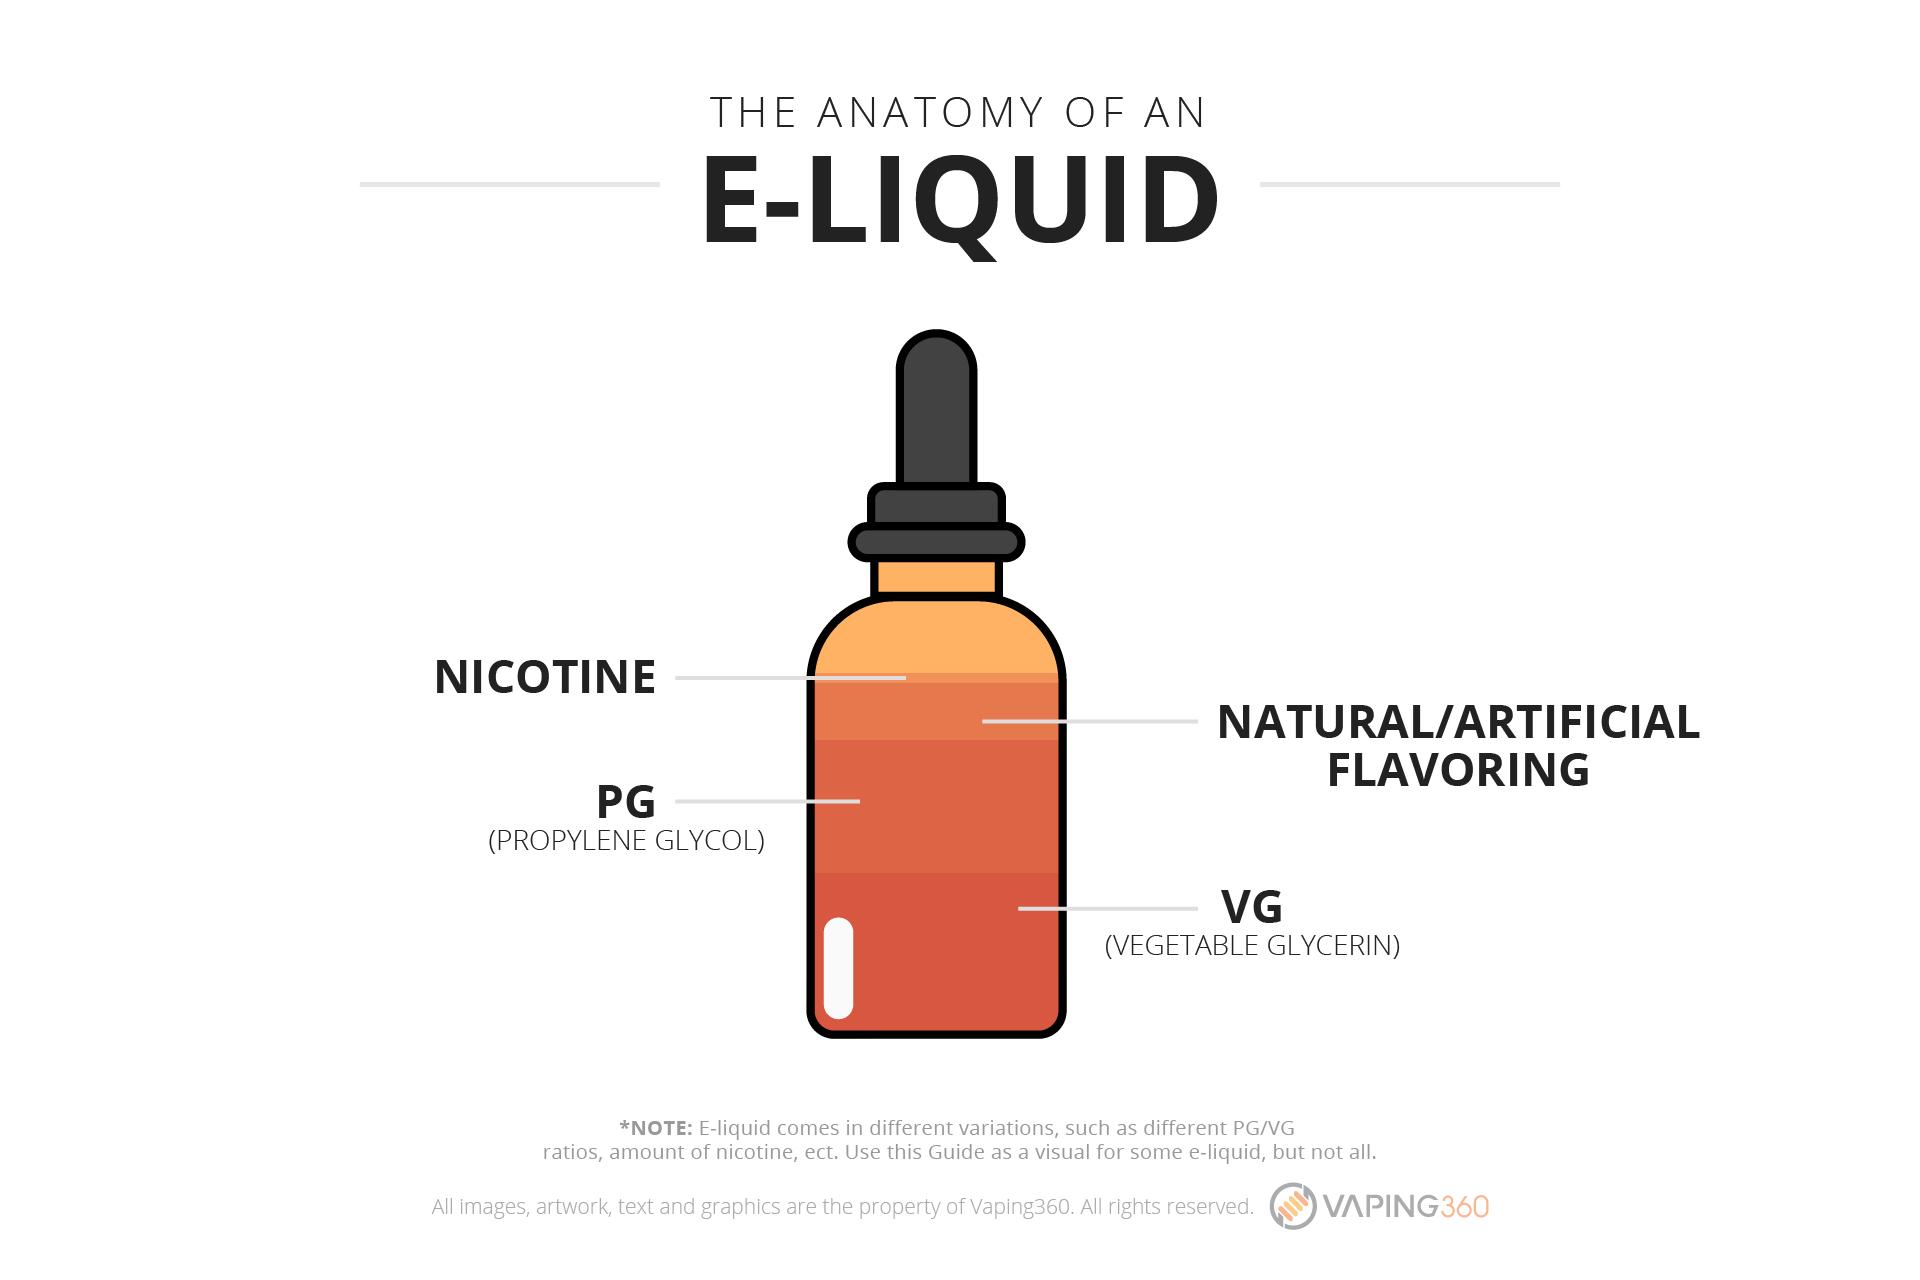 the-anatomy-of-an-e-liquid